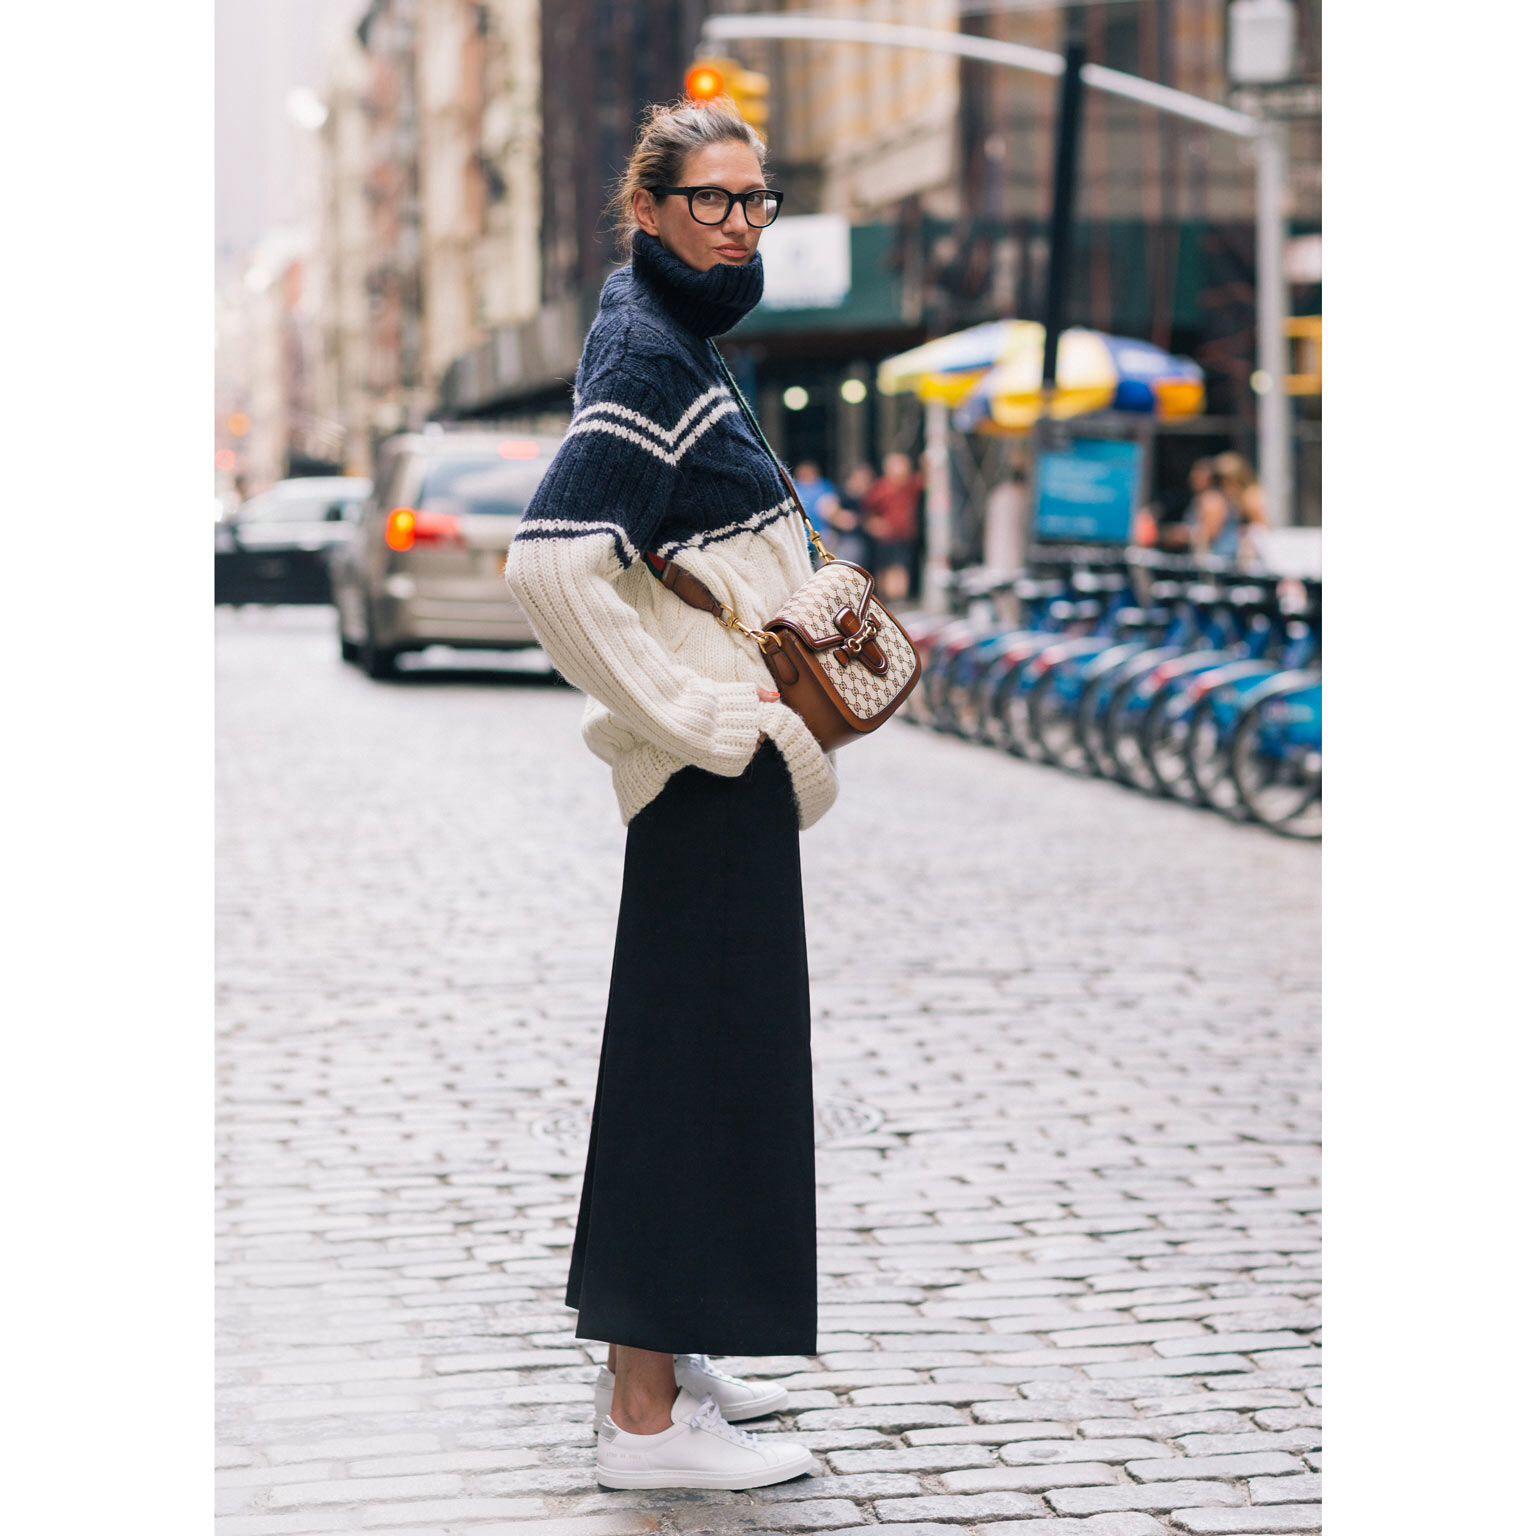 Buy Wang vera jenna lyons picture trends